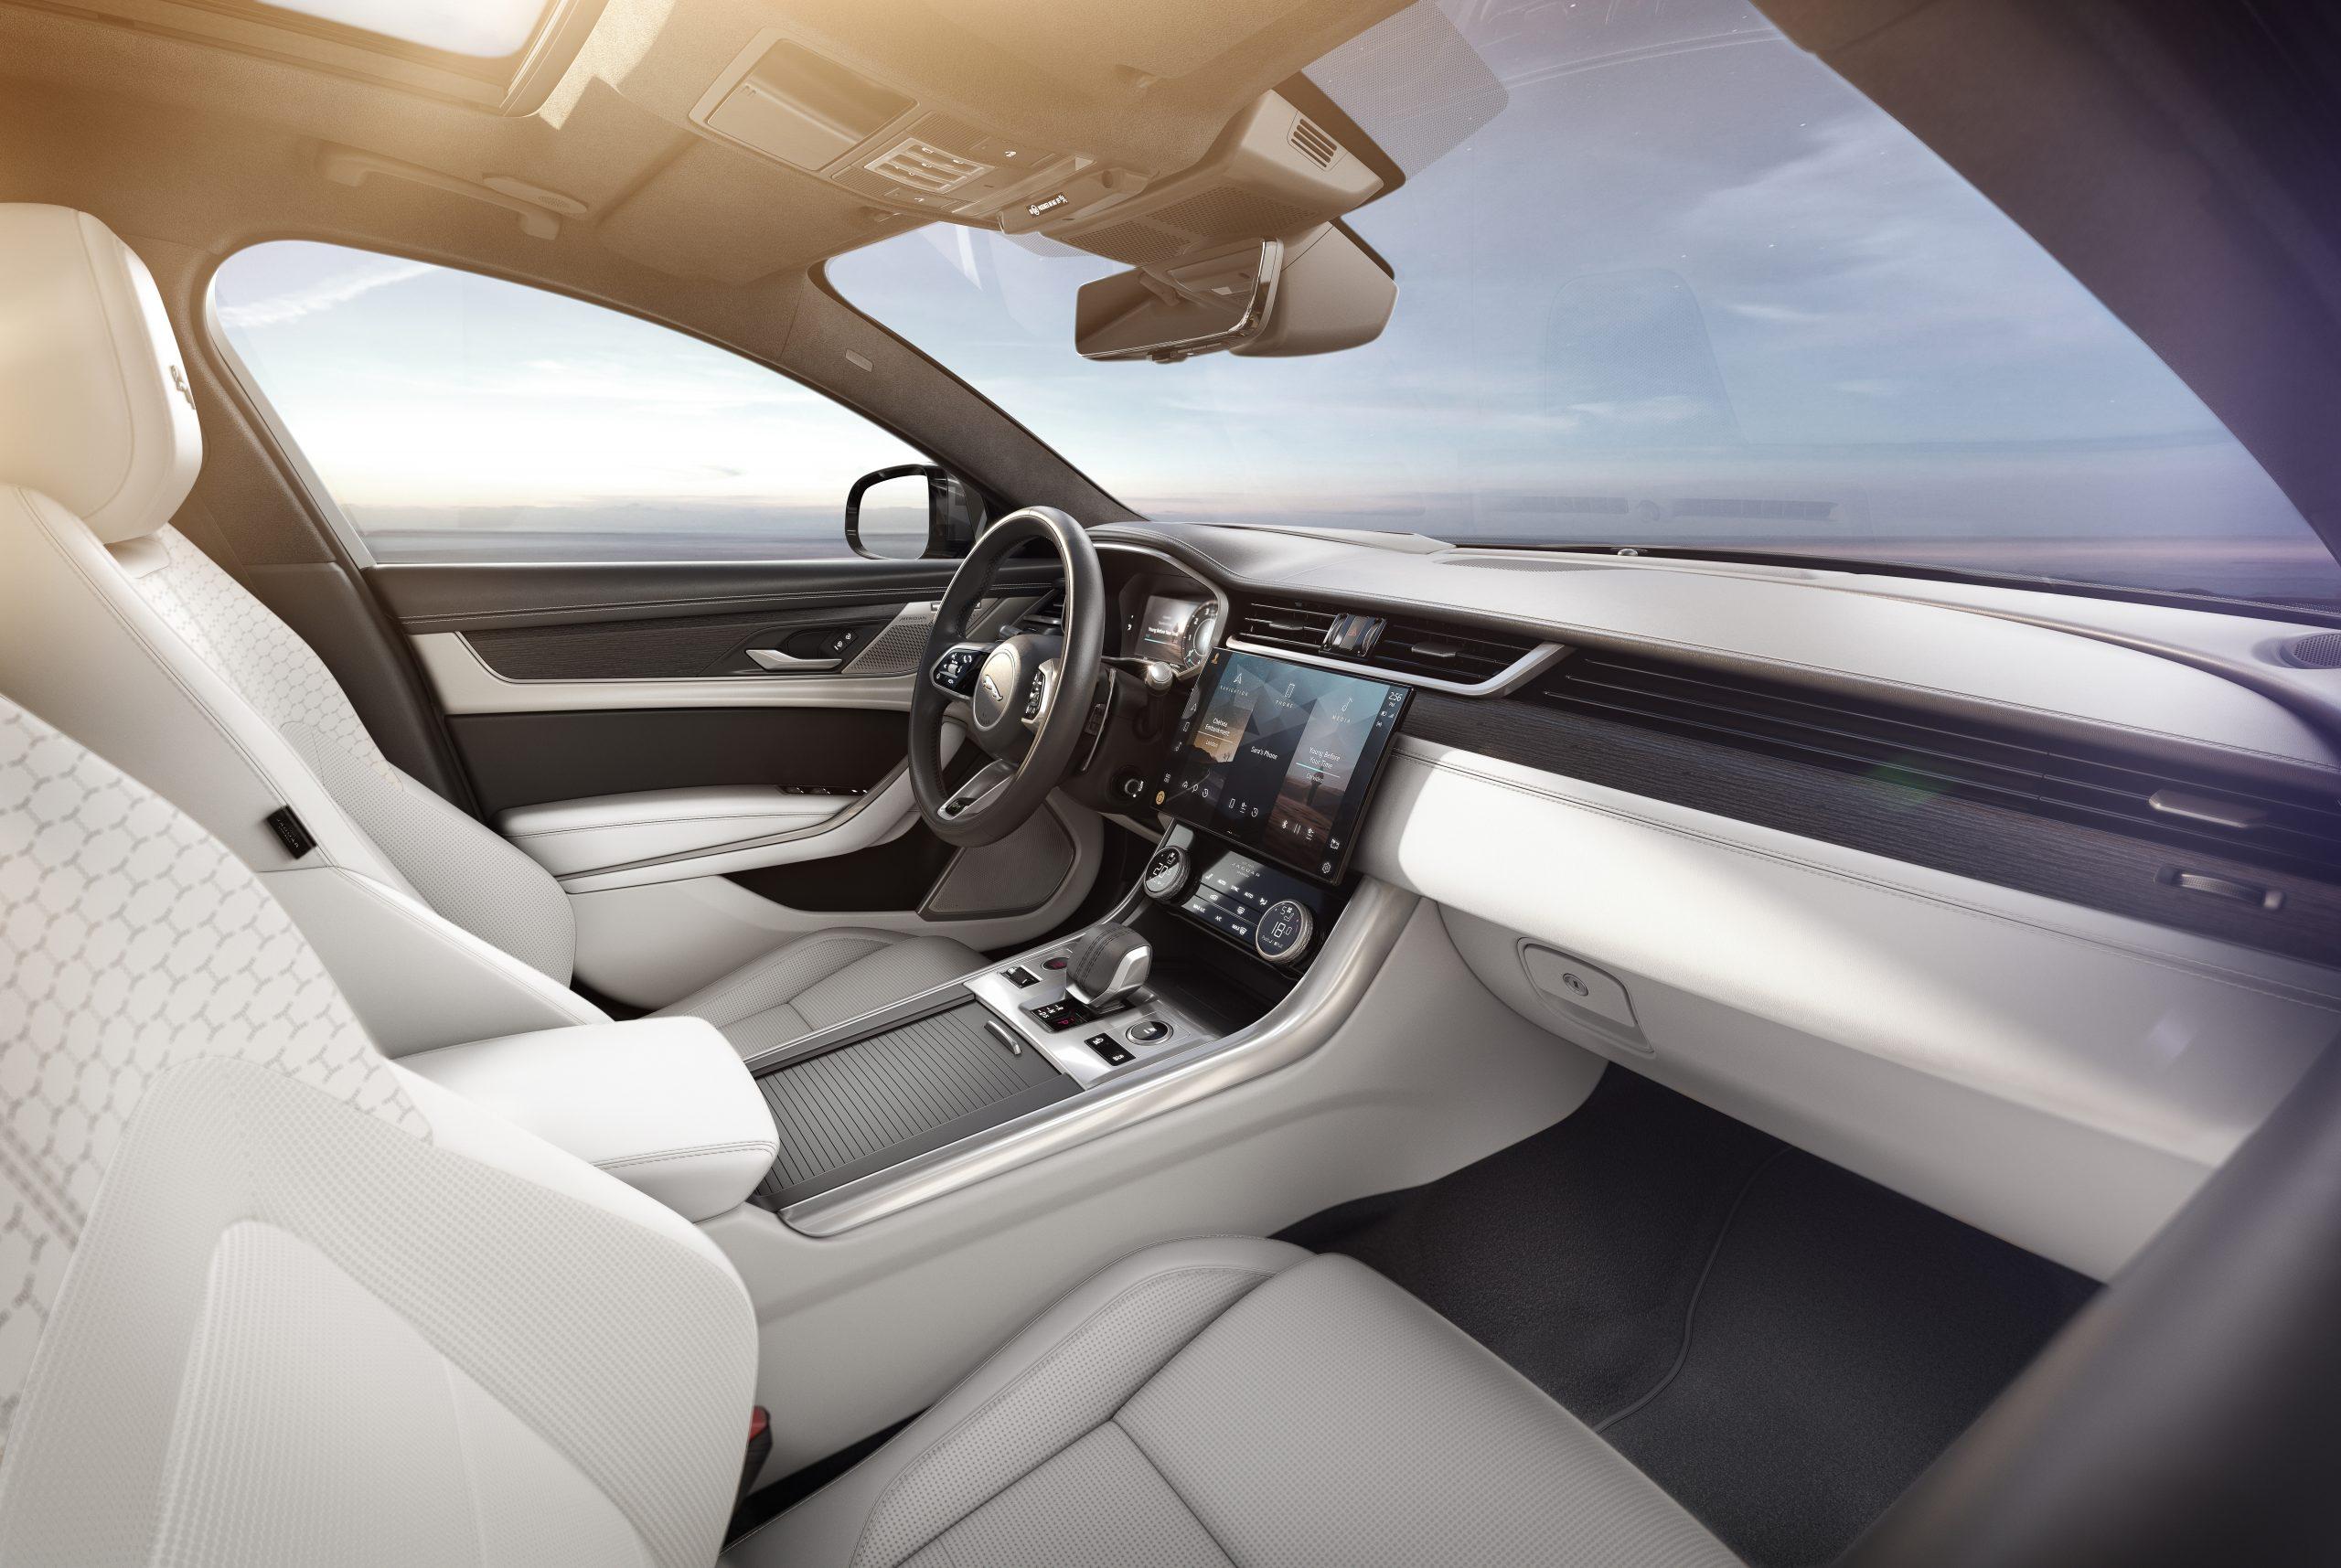 202021 Jaguar XF interior